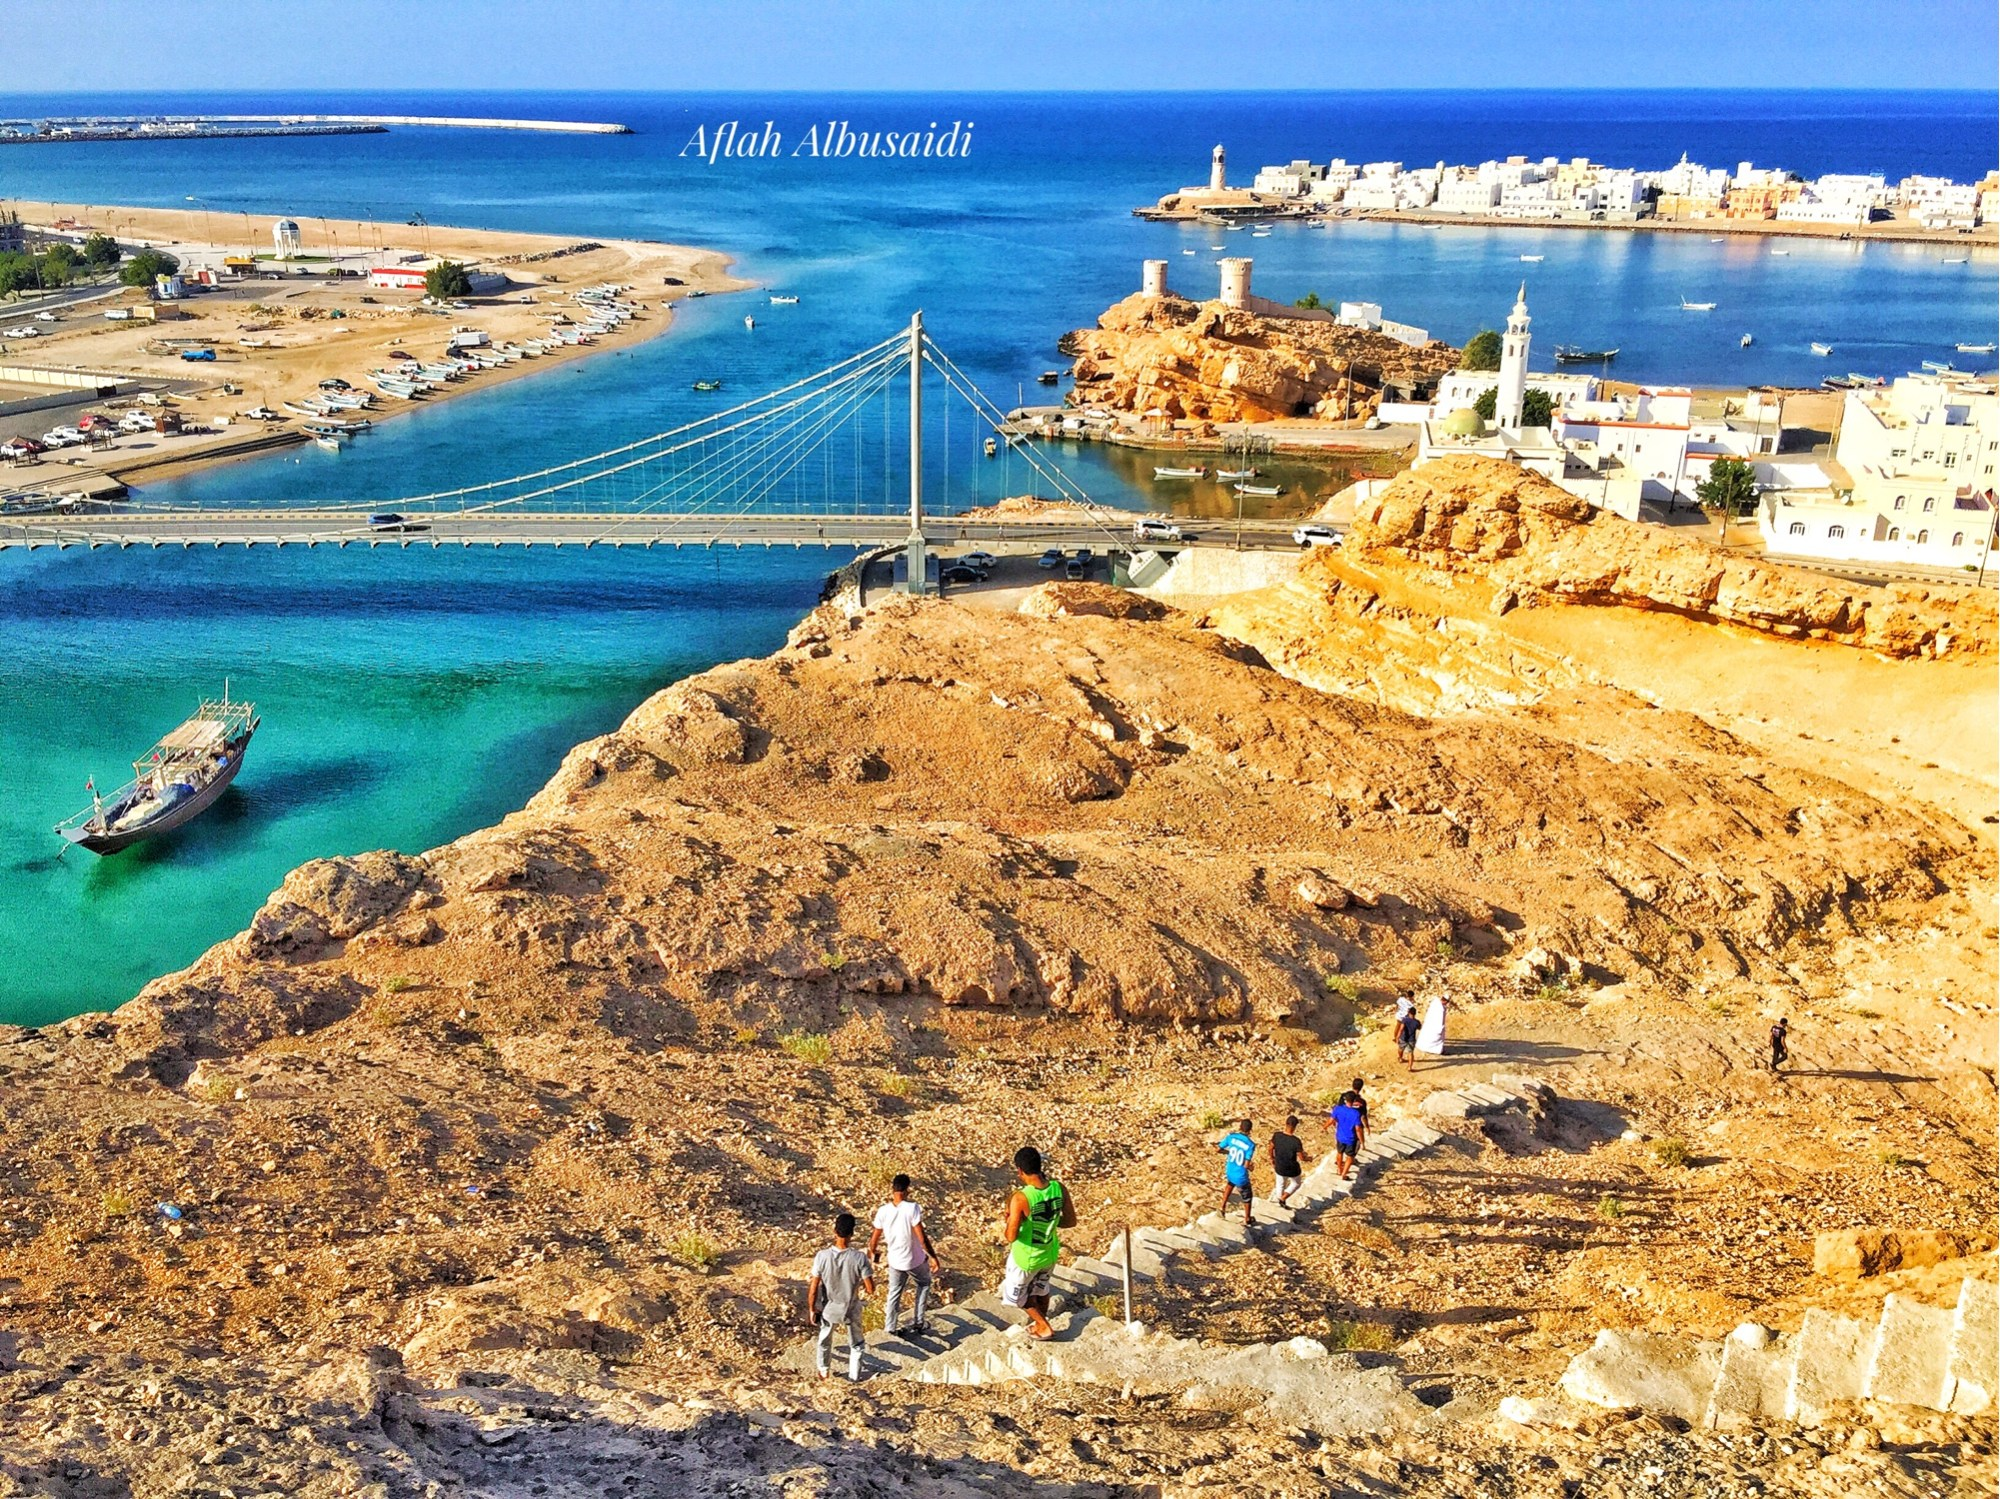 Aflah_albusaidi's Cover Photo